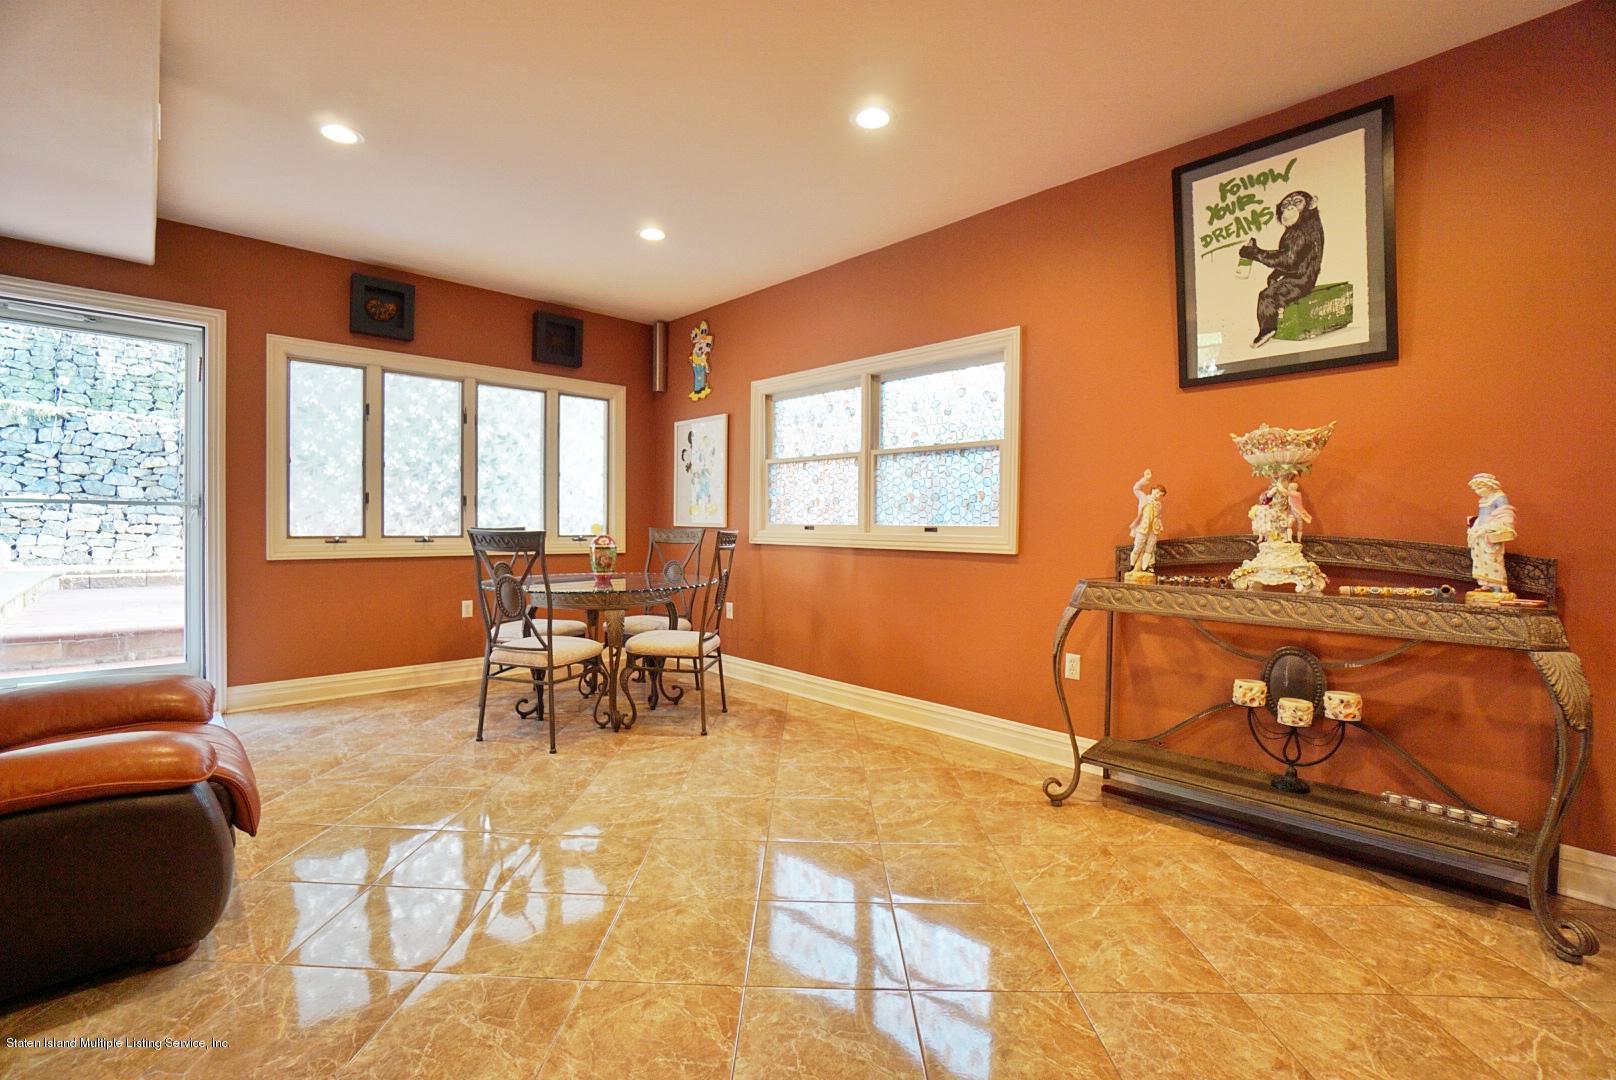 Single Family - Detached 48 Ocean Terrace  Staten Island, NY 10314, MLS-1130826-34